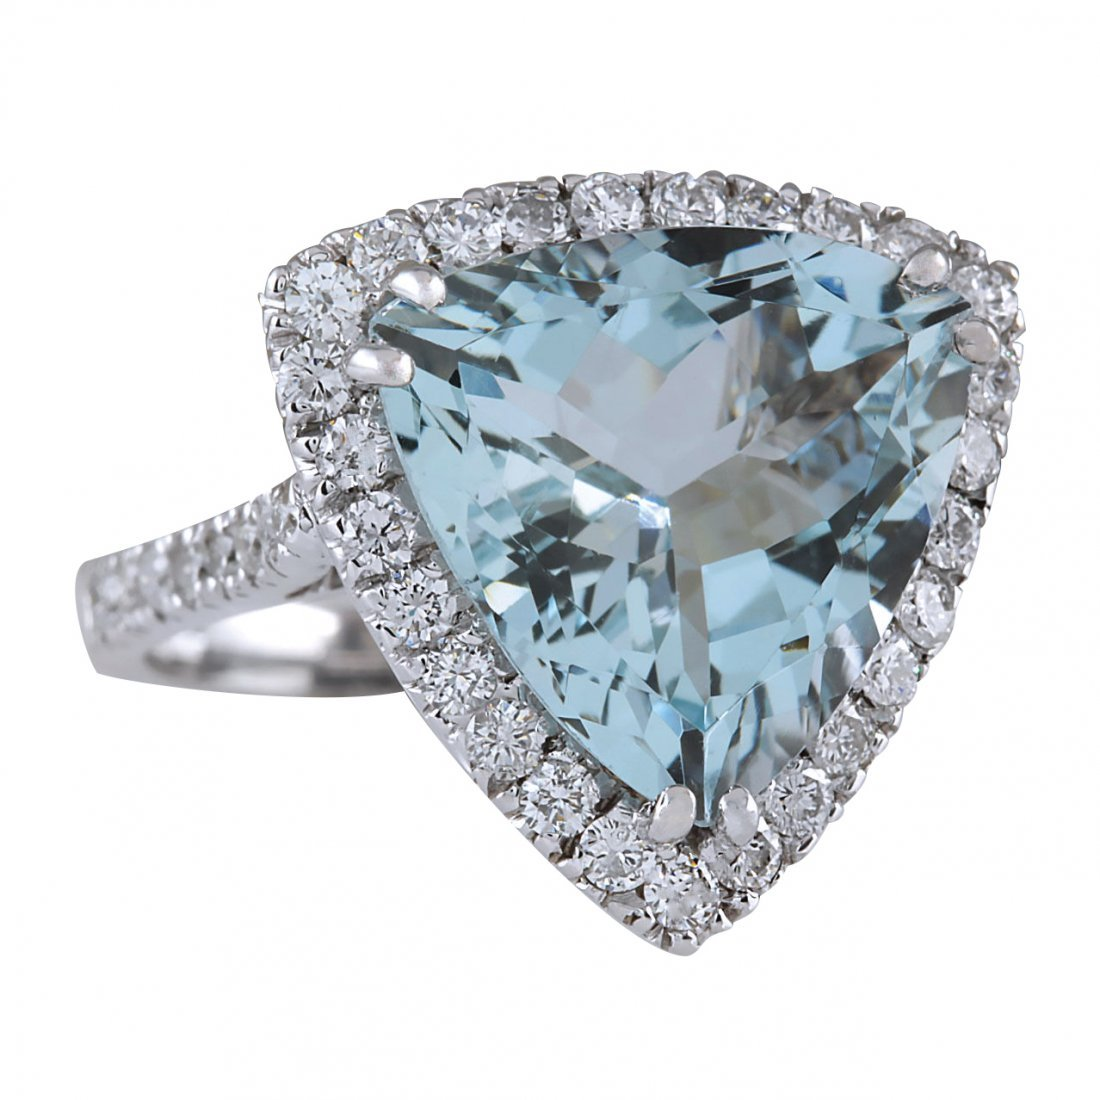 8.96CTW Natural Aquamarine And Diamond Ring In 14K - 2